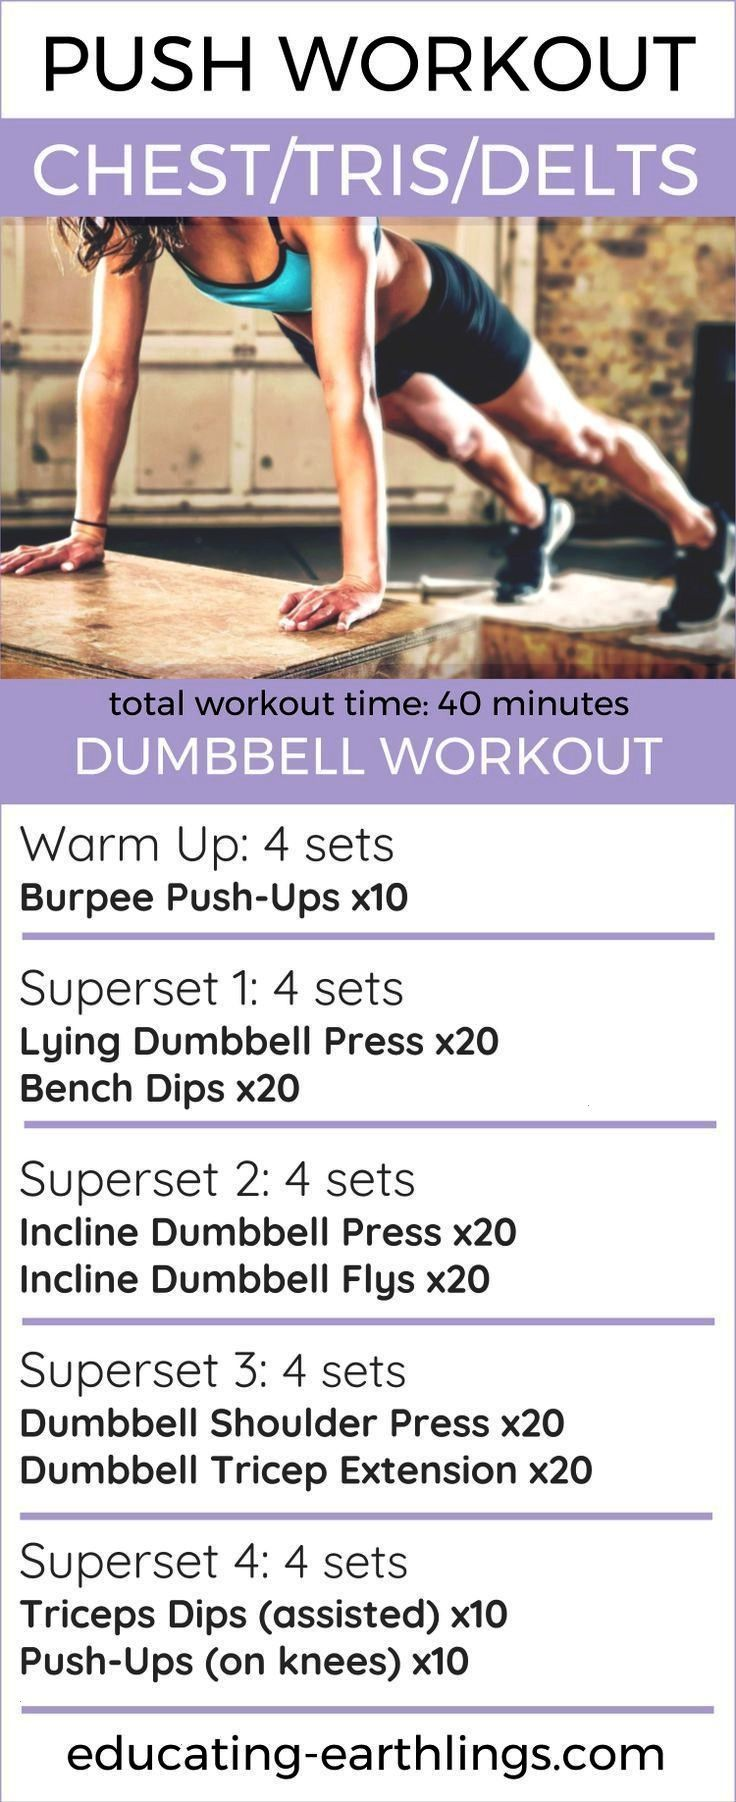 #pushpullleg #women39s #workout #fitness #healthy #womens #split #chest #women #push #lPush Workout:...